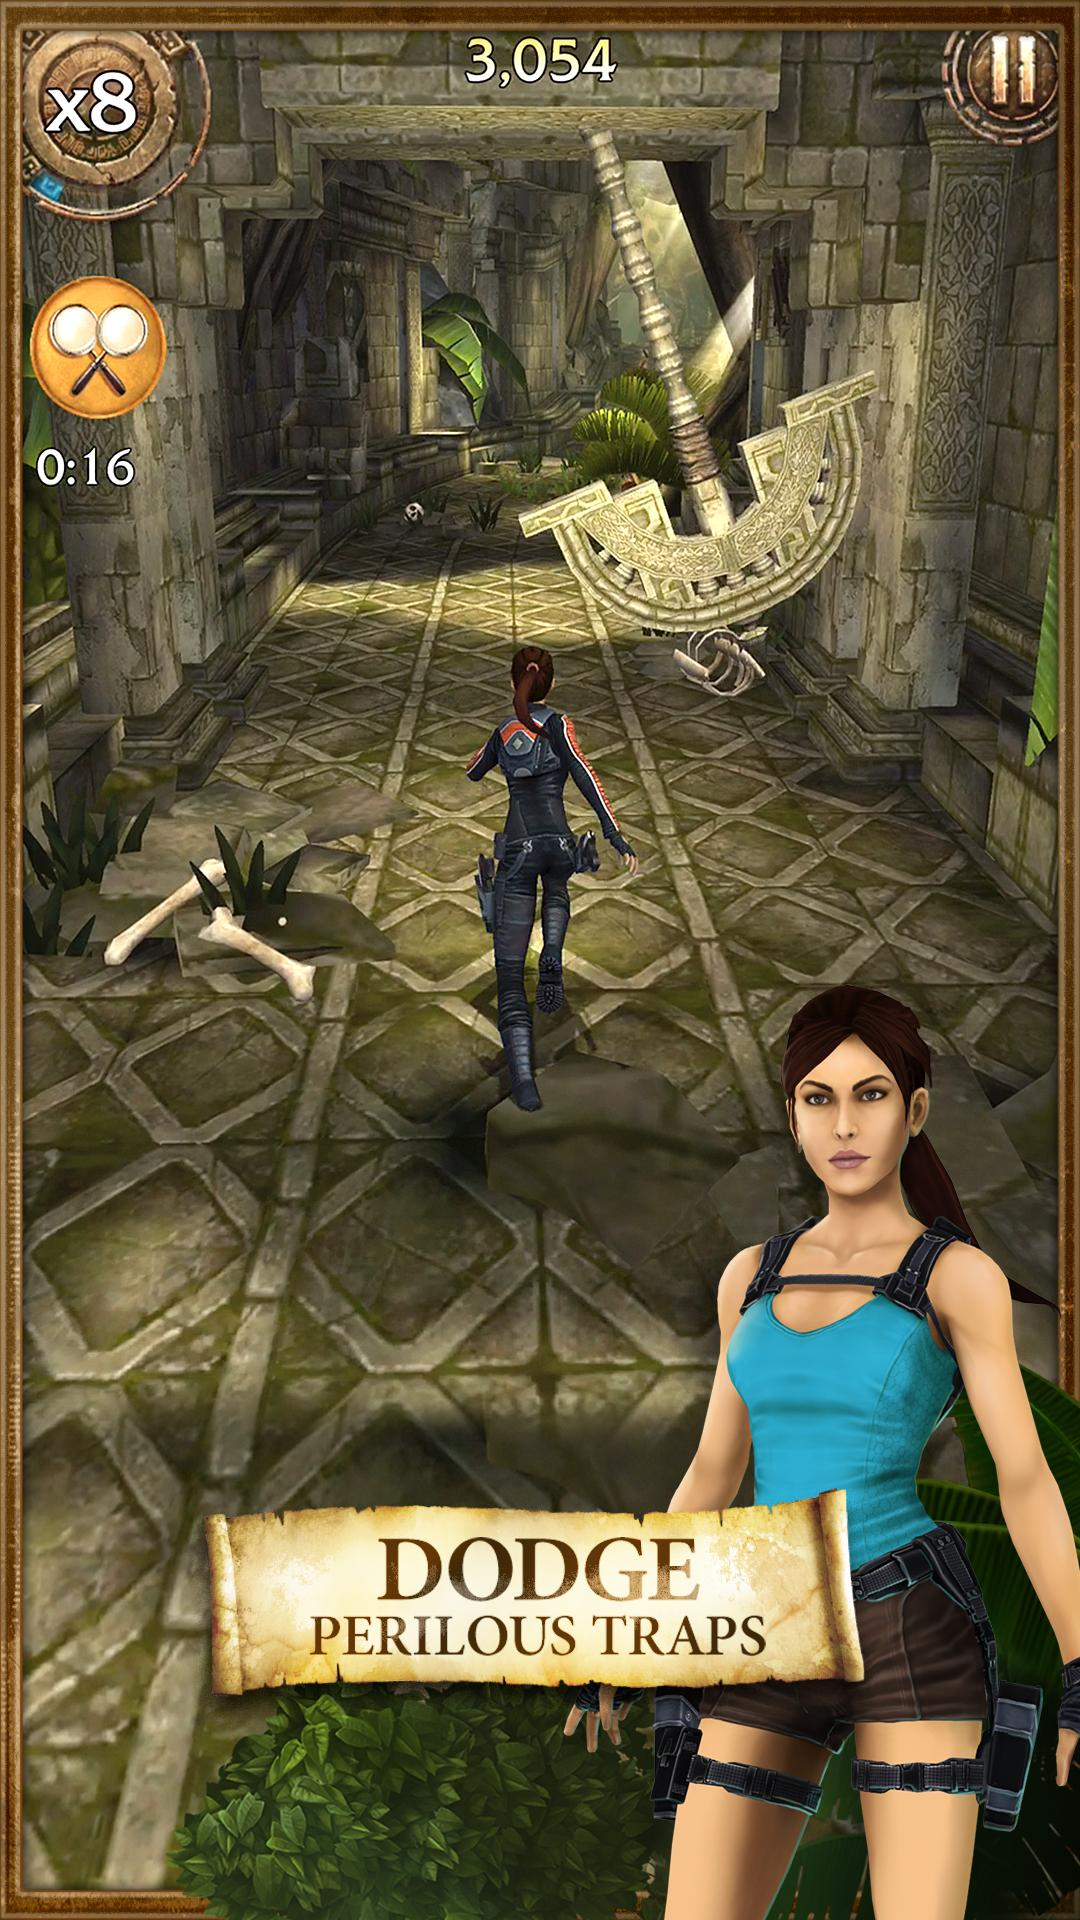 Lara Croft: Relic Run 1.11.112 Screenshot 1